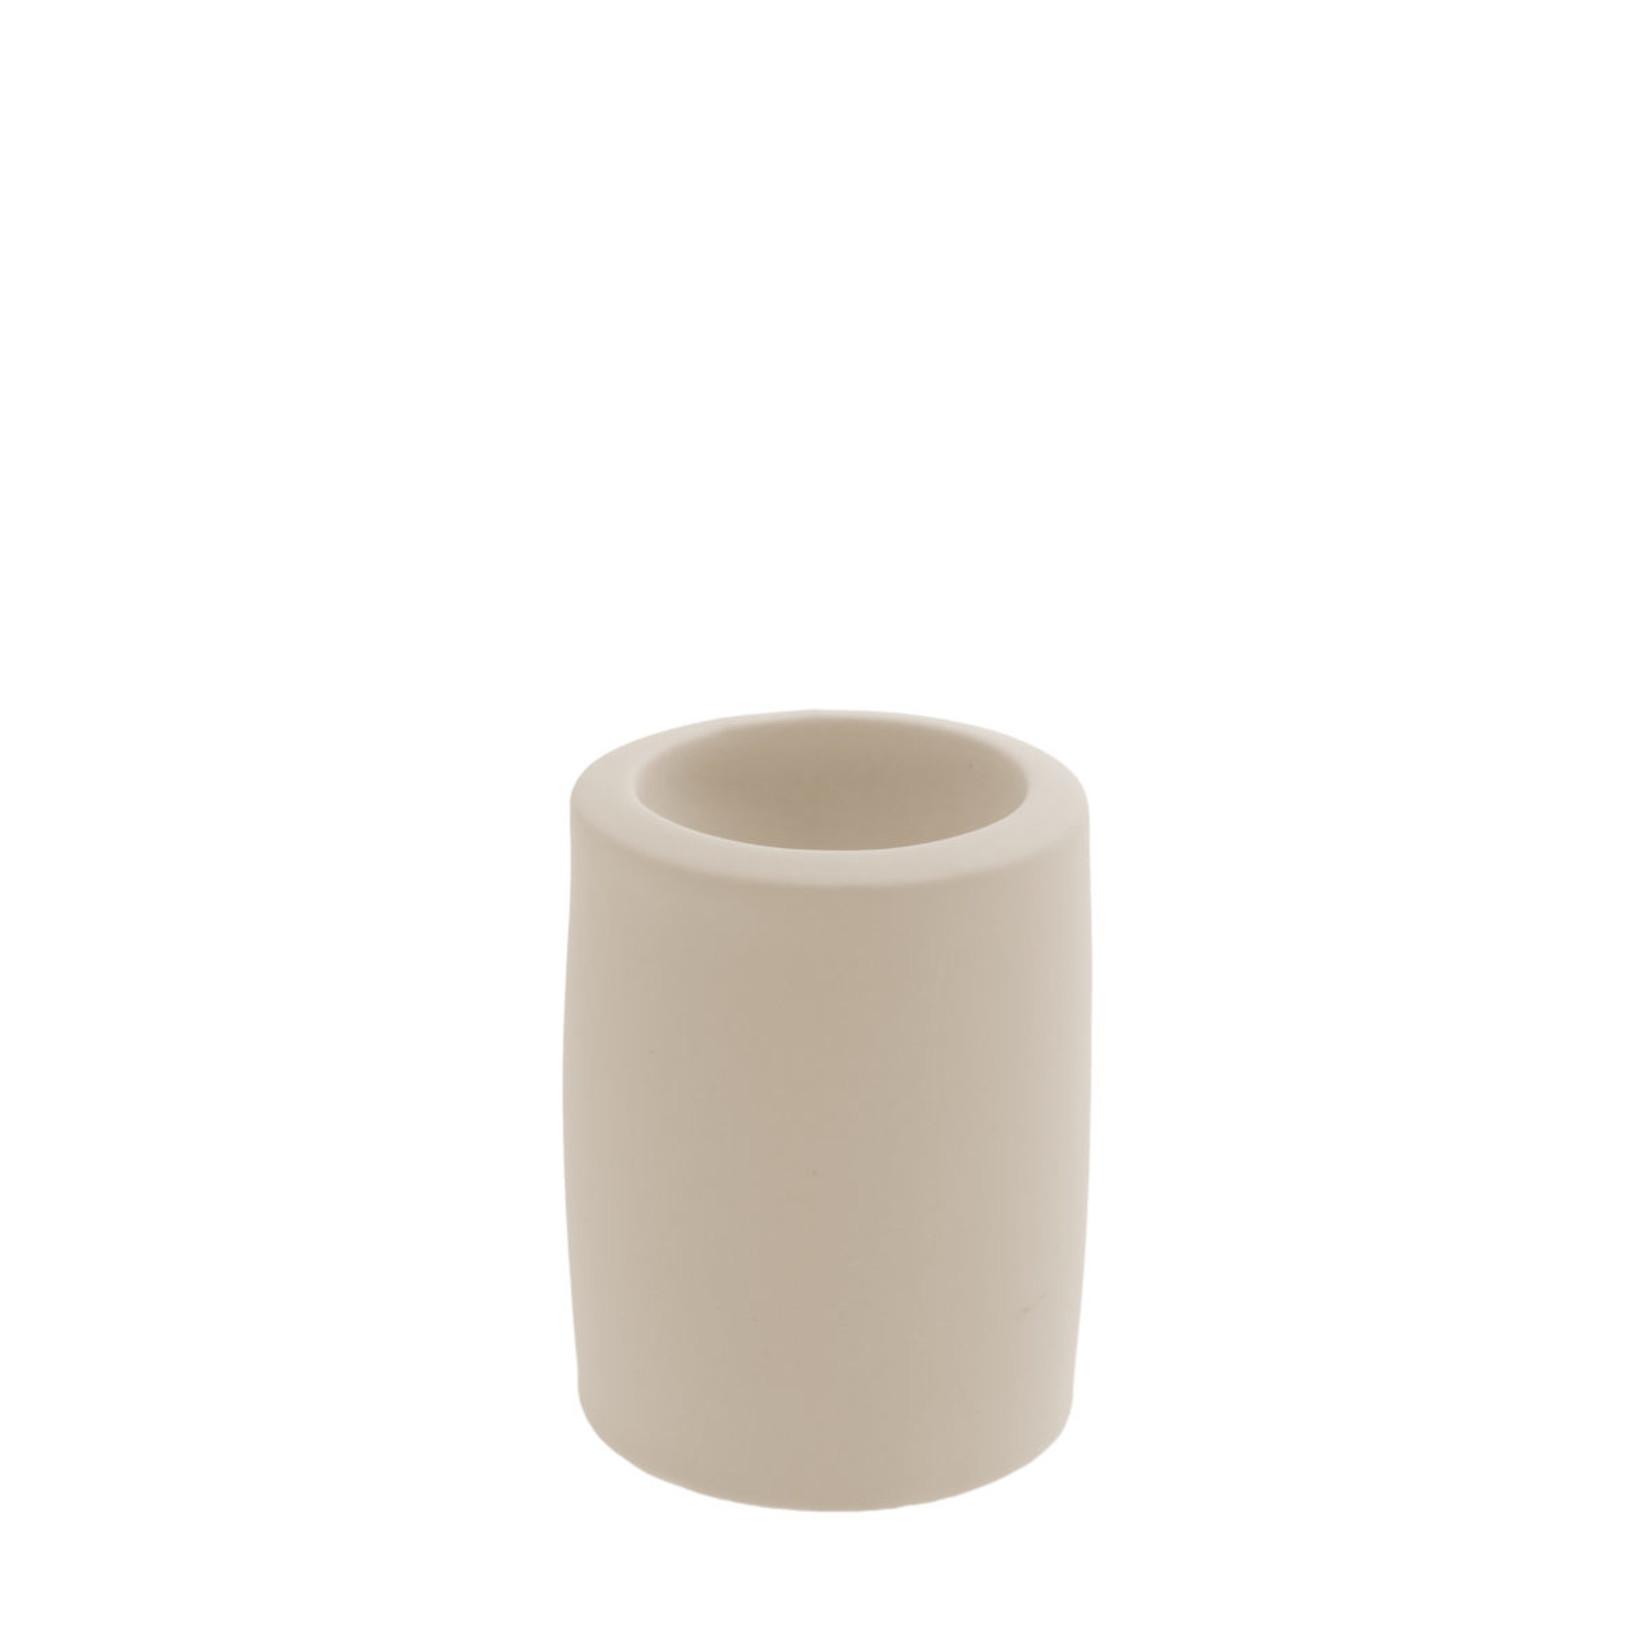 Storefactory  Lekvall Teelichthalter beige M